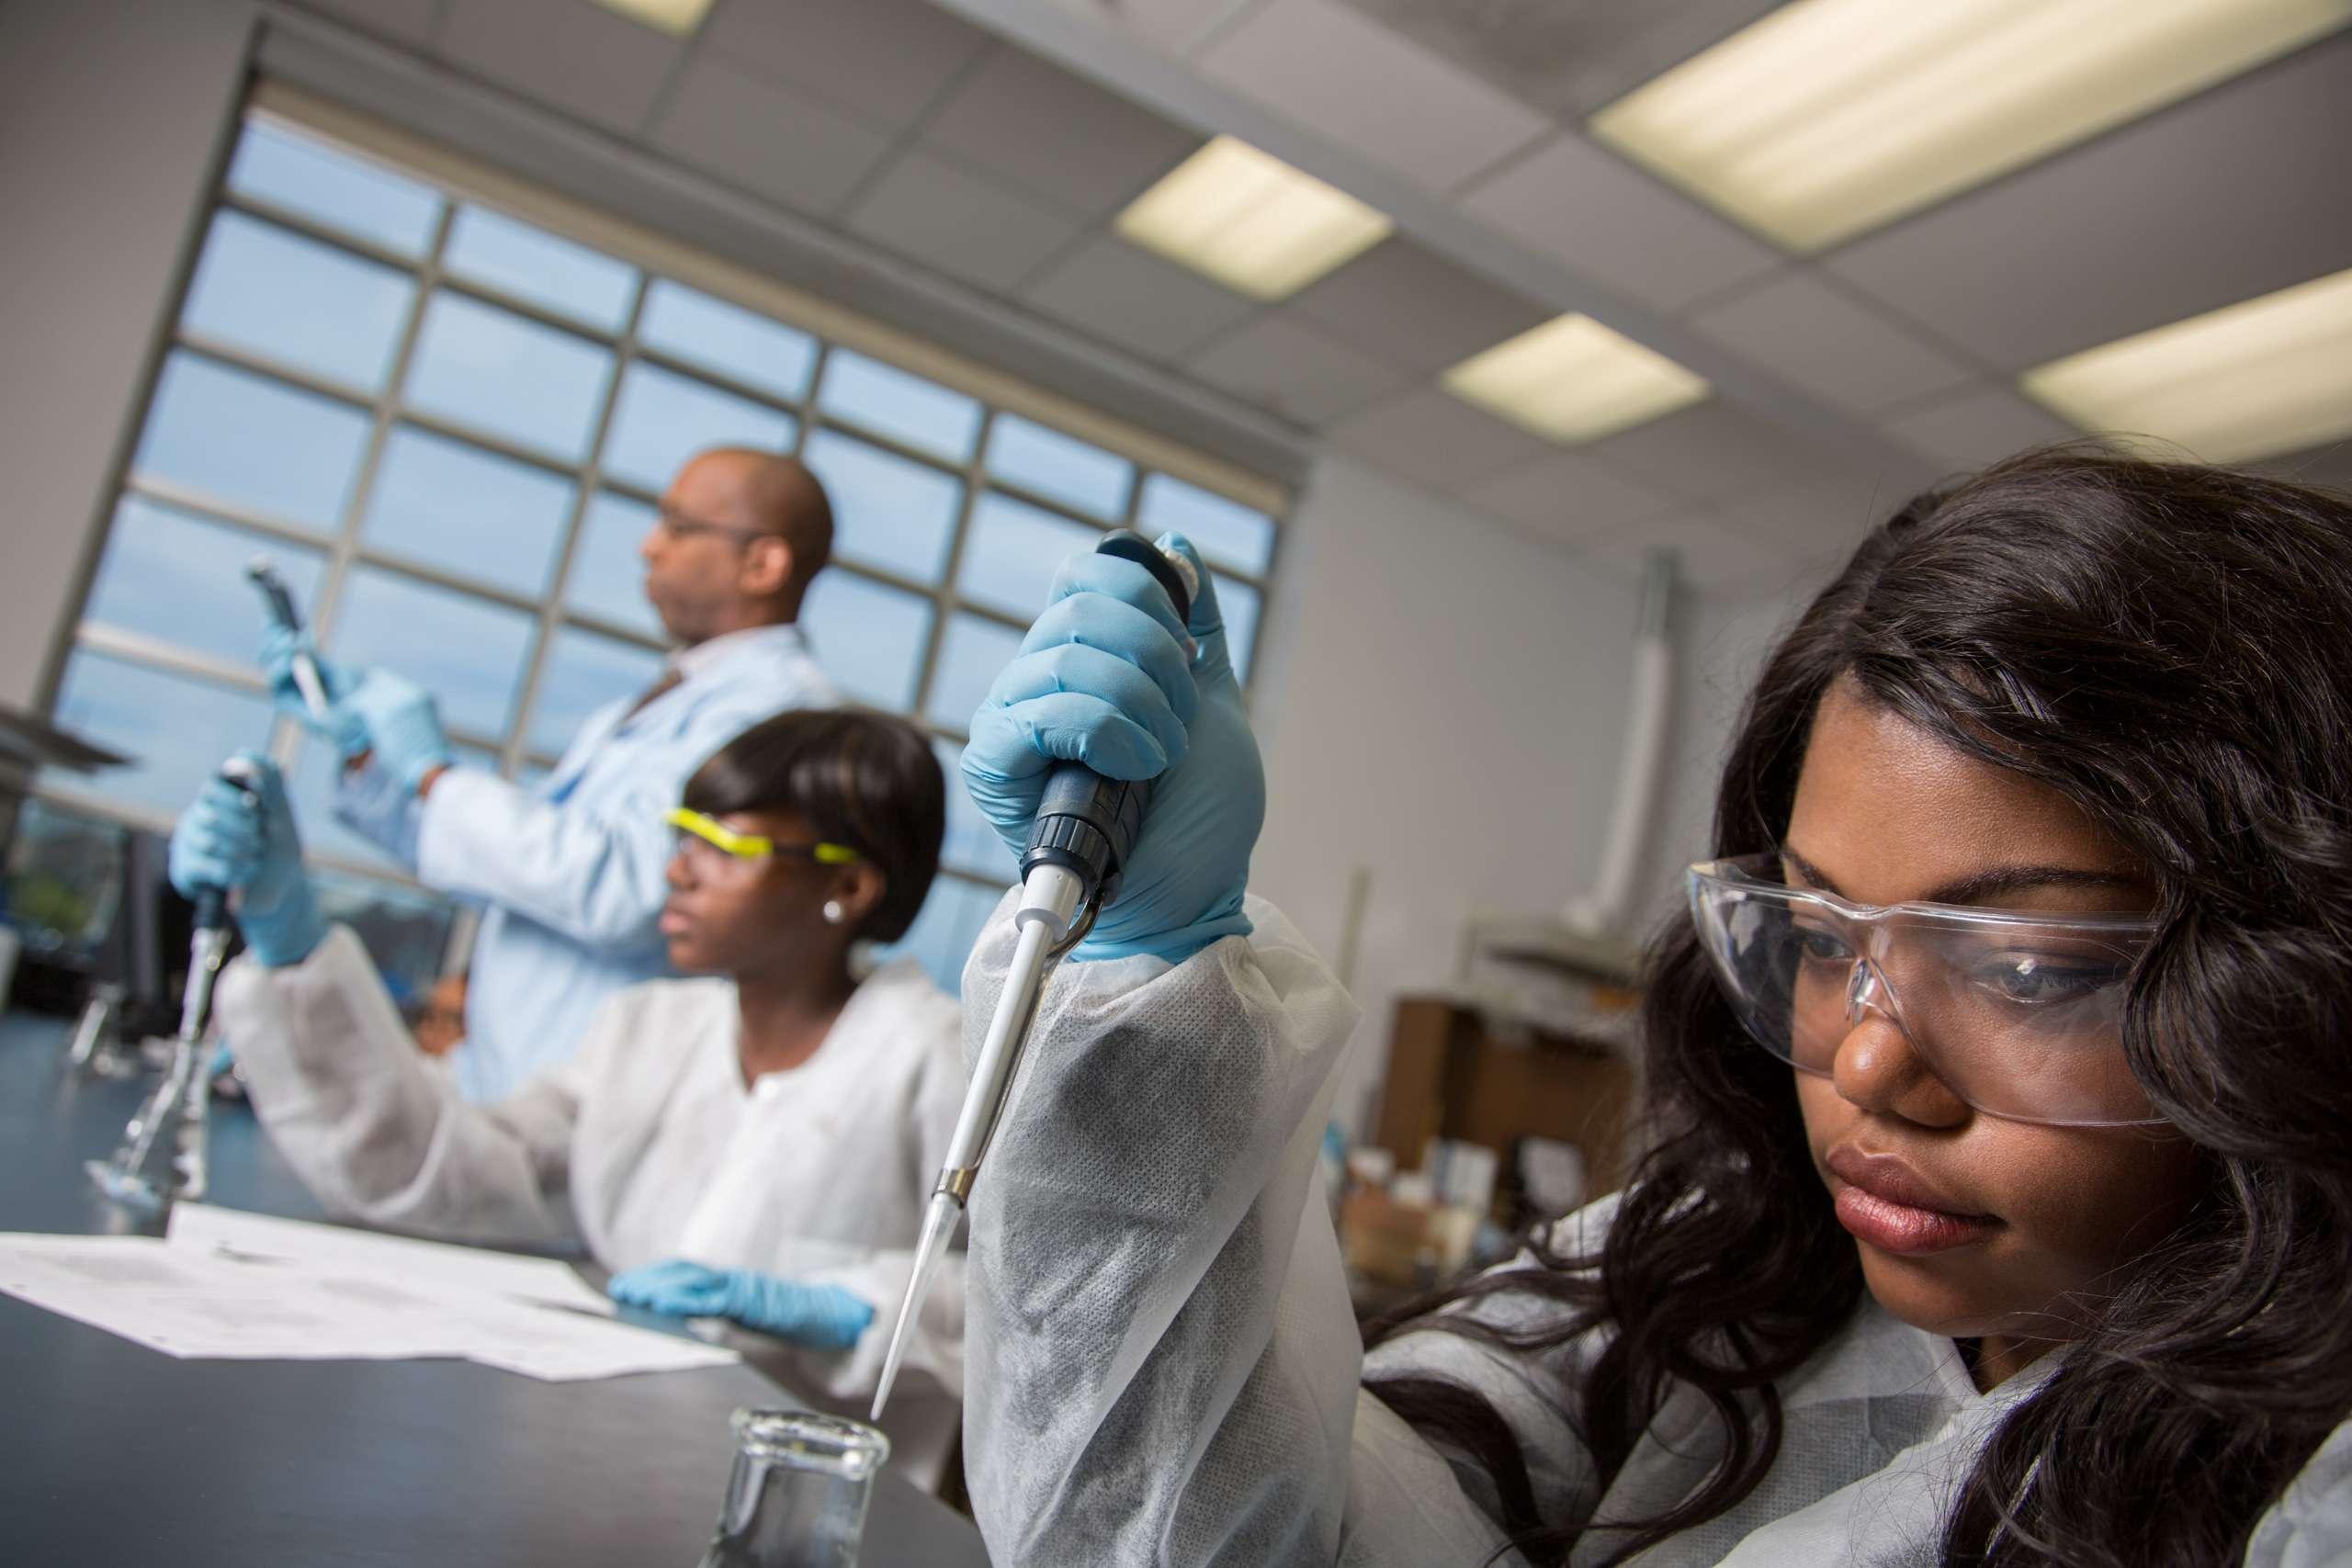 PORTFOLIO - People #25 Laboratory Technicians in Training